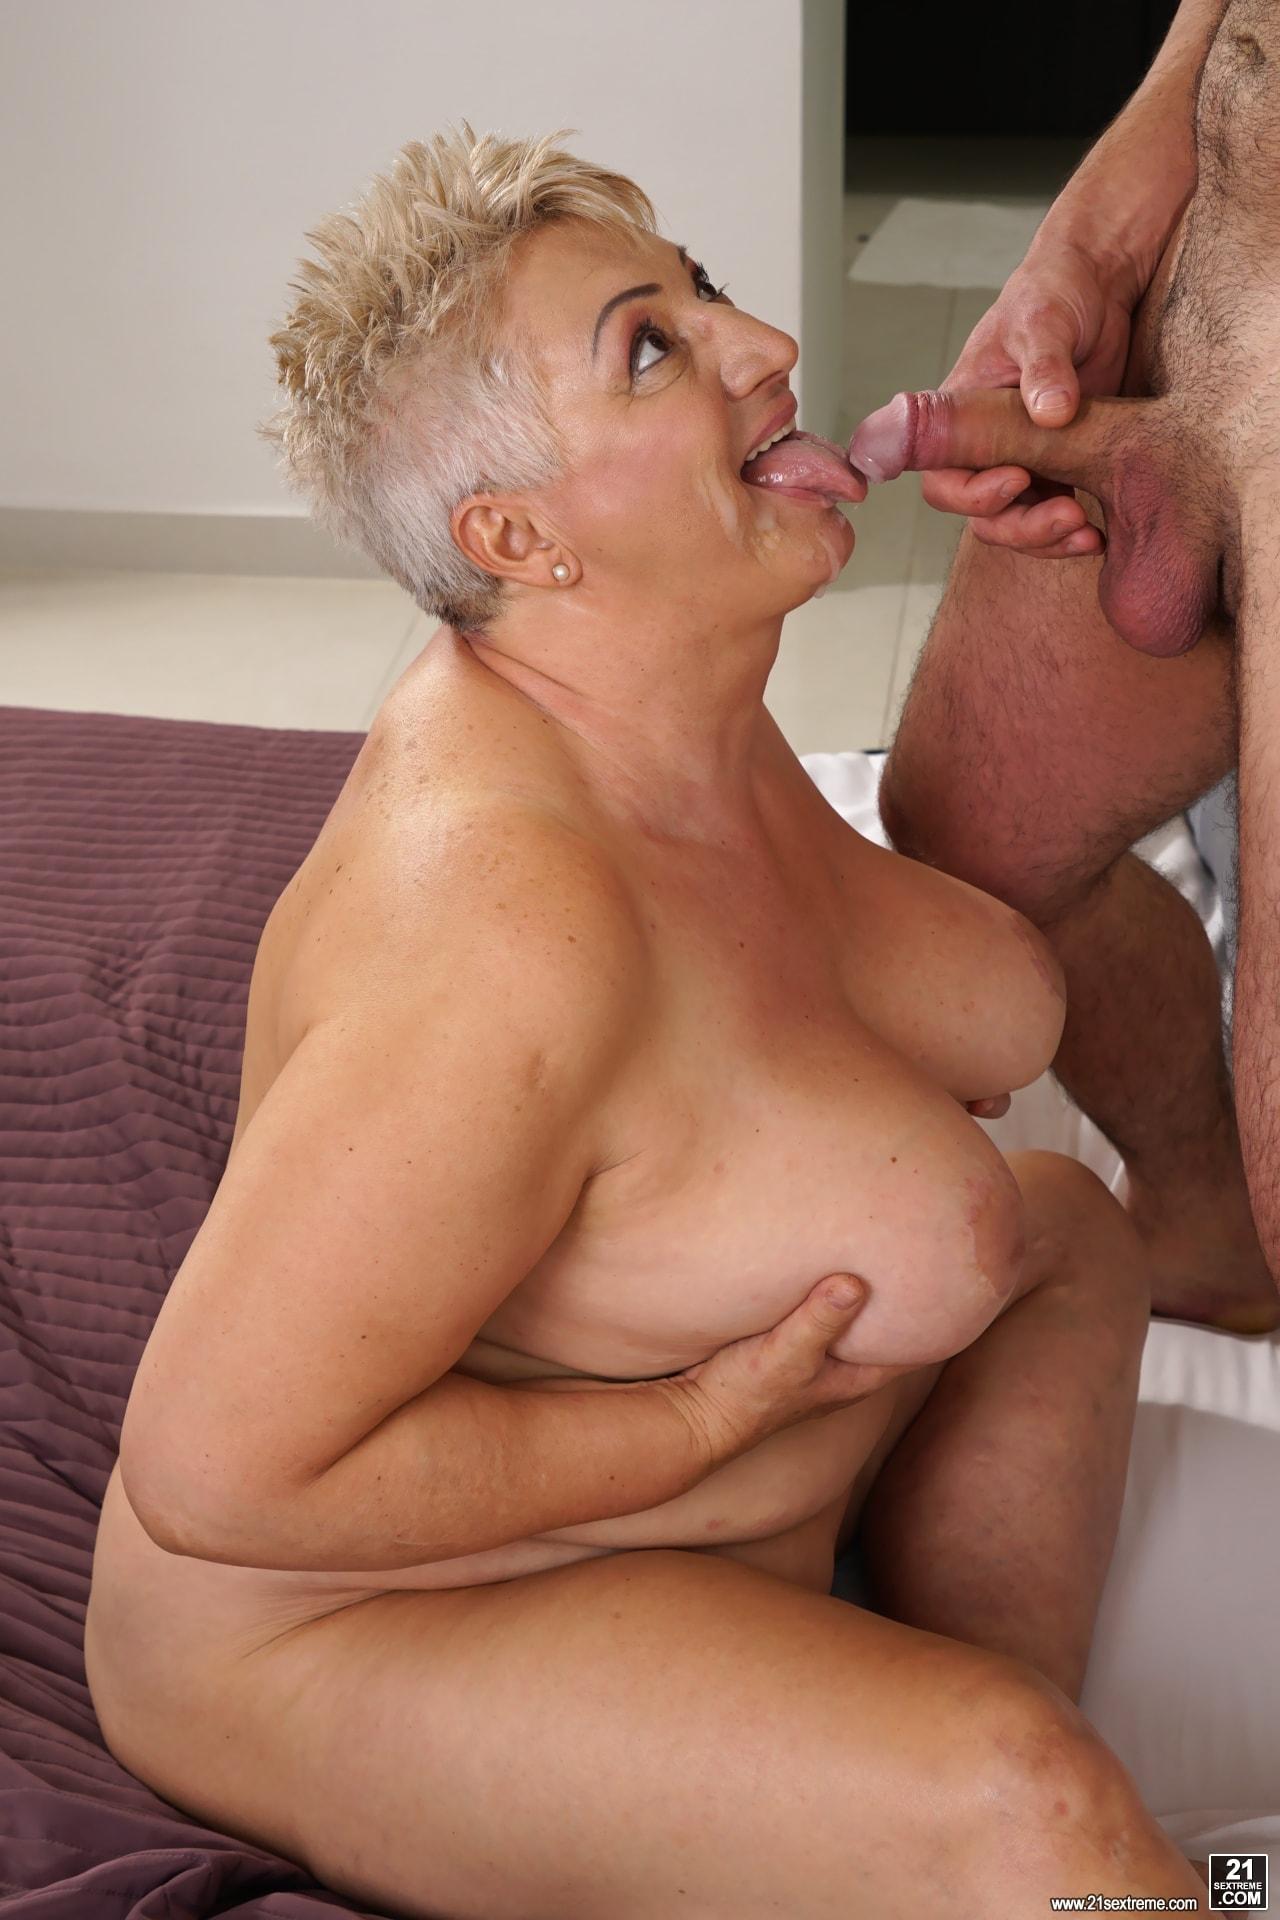 Blowjob grandma tits videos bottomless naked woods